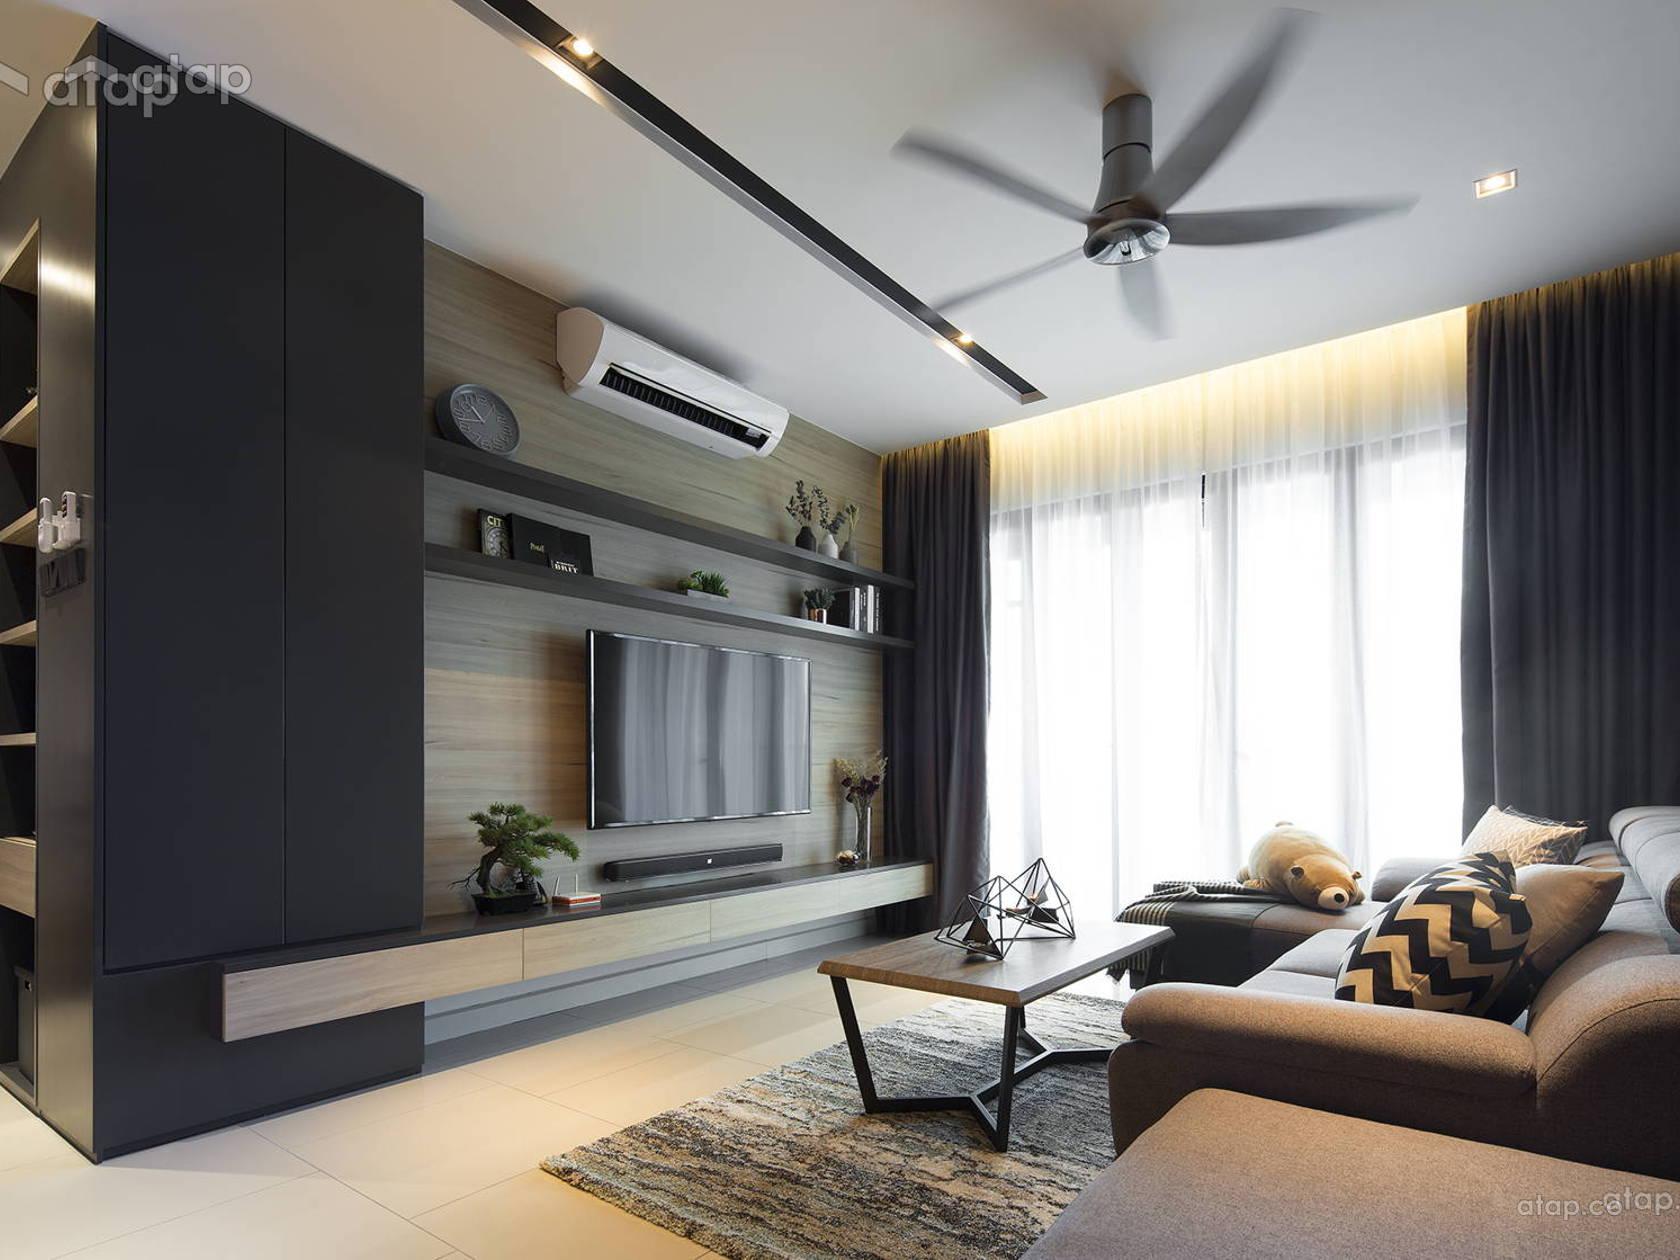 16 living room designs - iproperty.com.my on Photo Room Decor  id=36179